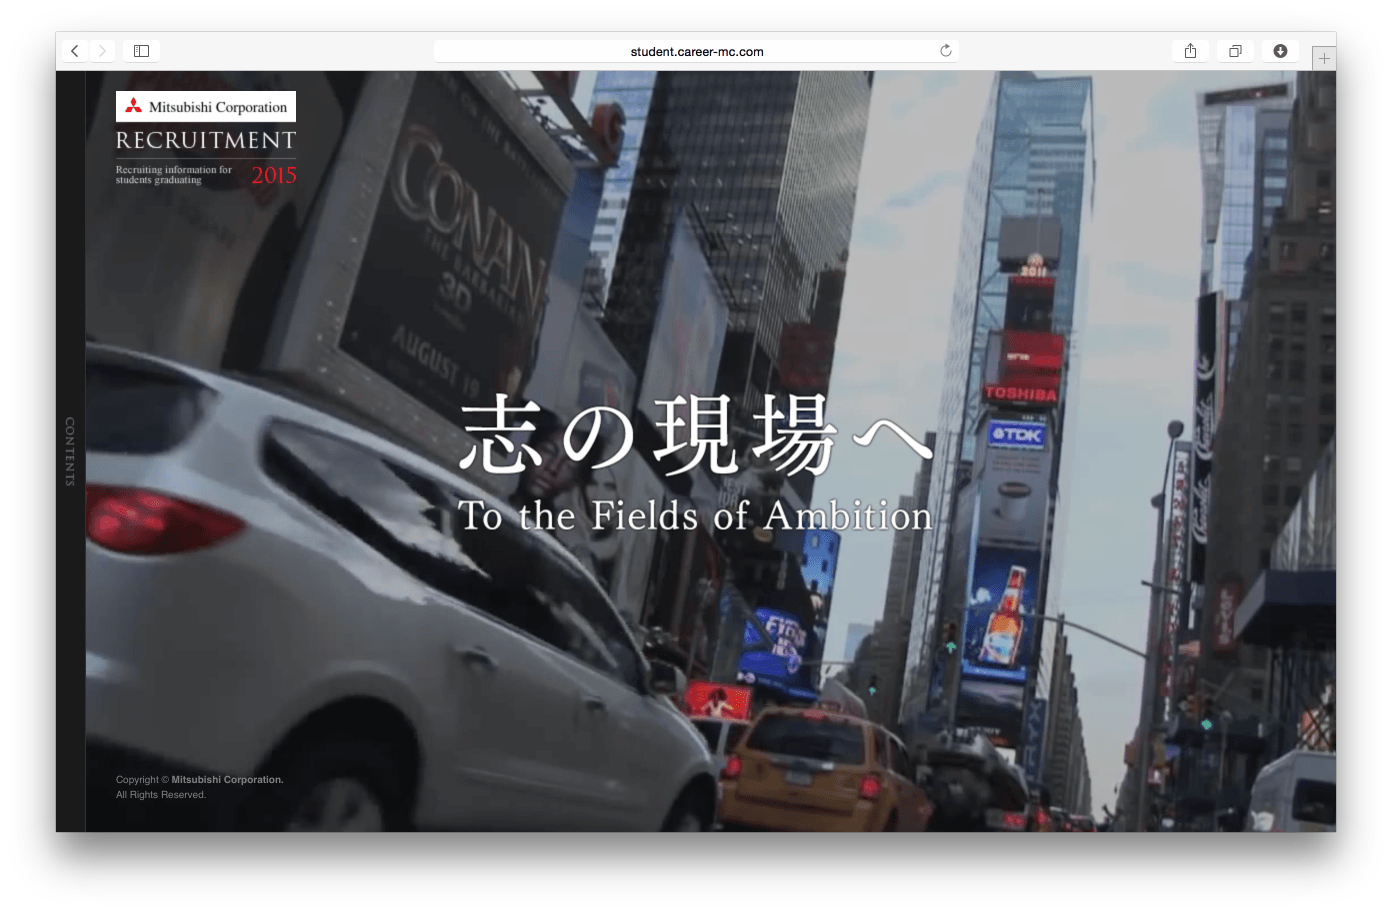 Mitsubishi Corporation 志の現場へ